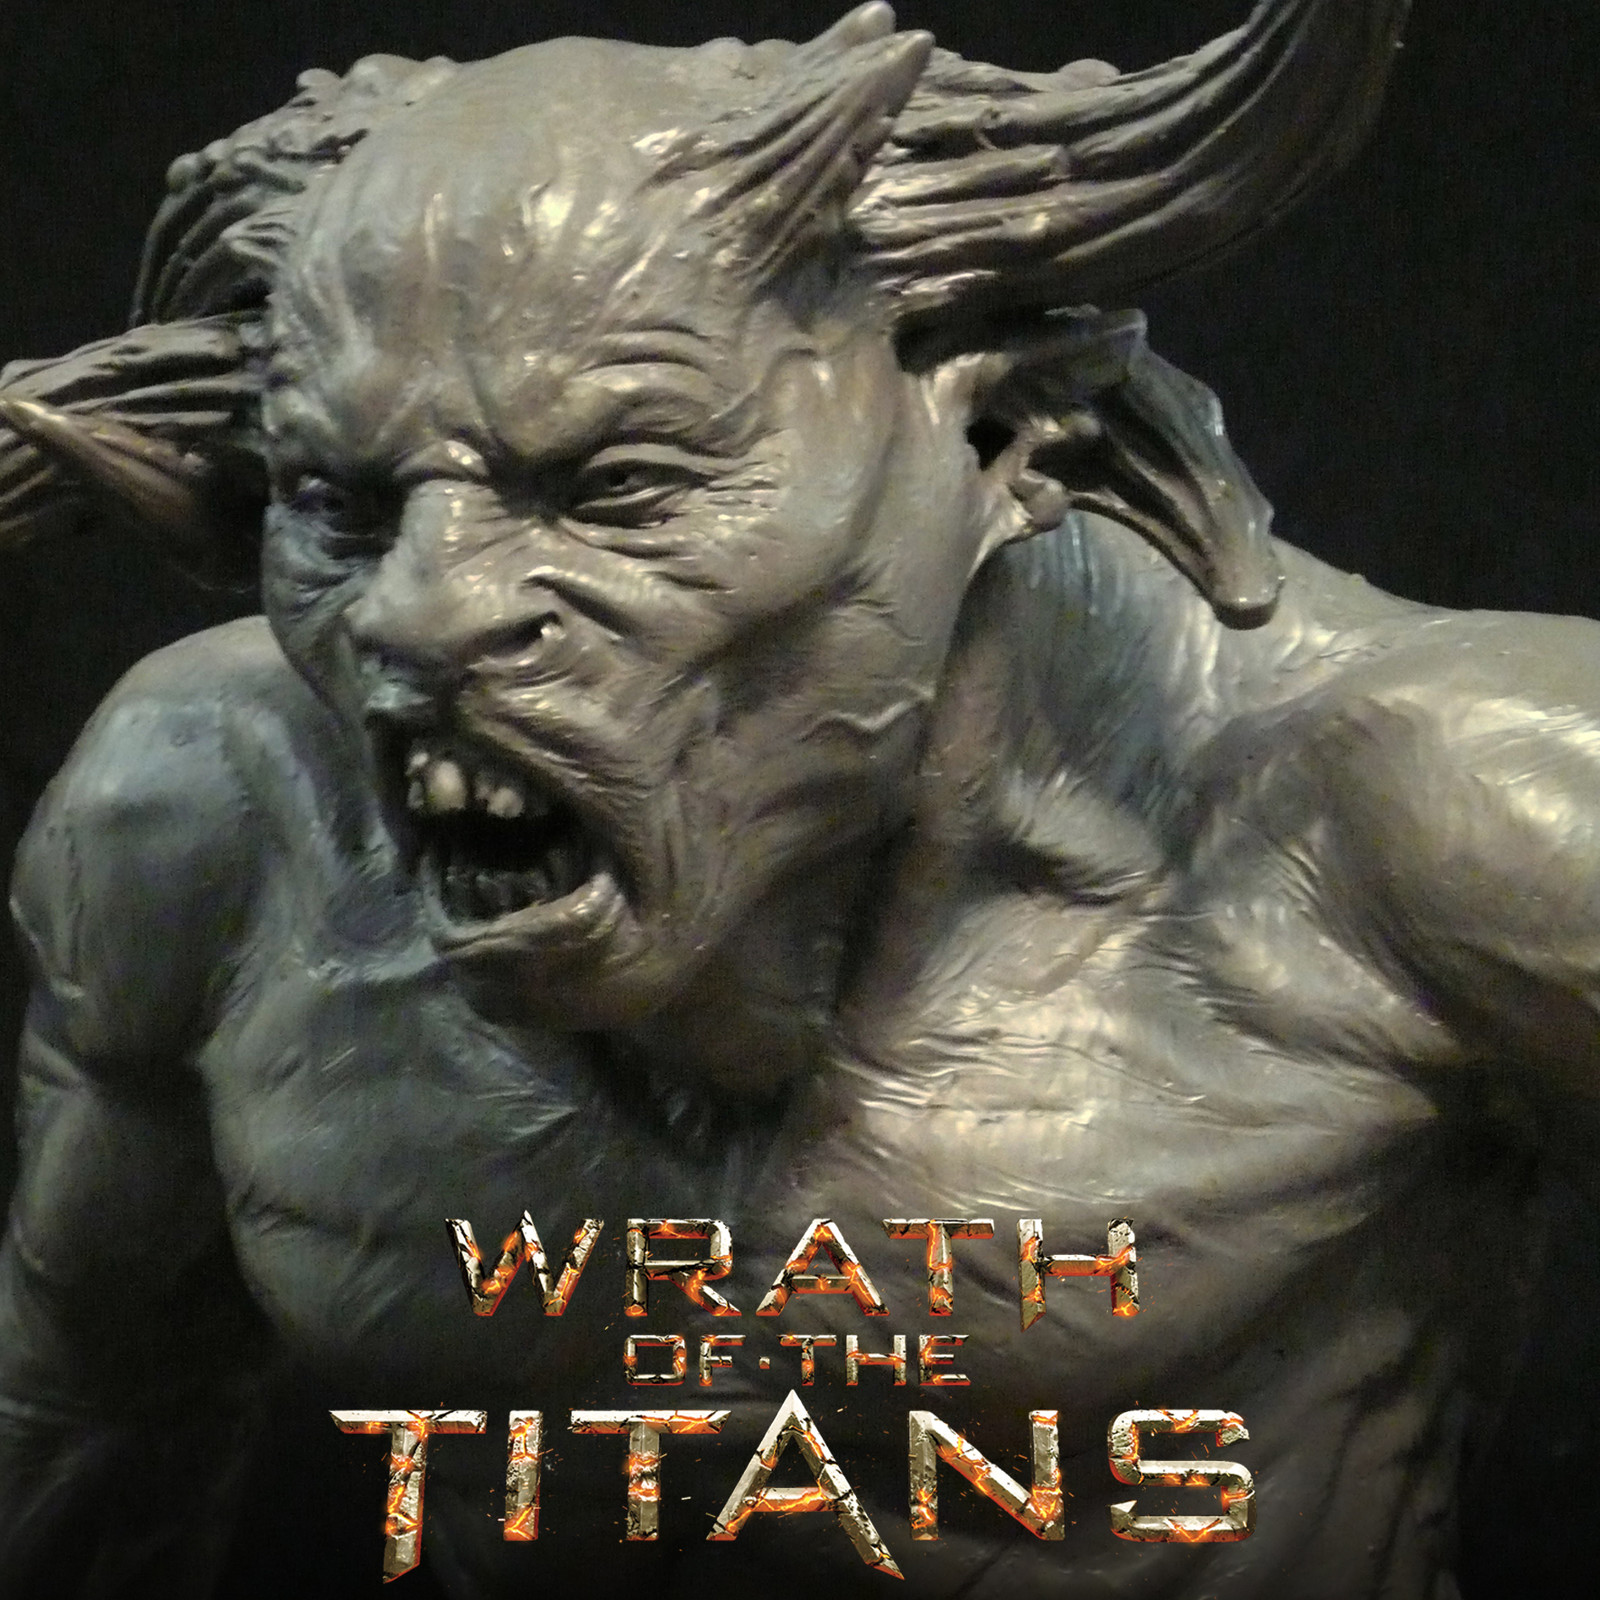 Wrath of the Titans - Minotaur